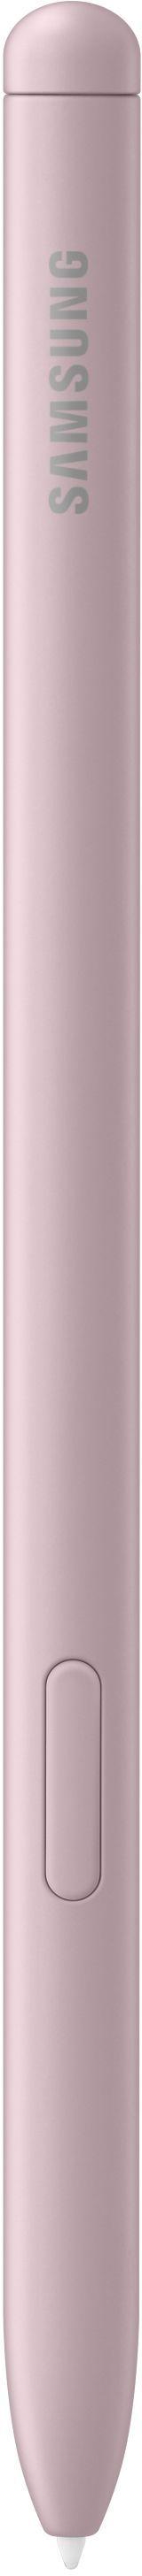 Планшет Samsung Galaxy Tab S6 Lite Wi-Fi 64GB (SM-P610NZIASEK) Pink от Територія твоєї техніки - 9